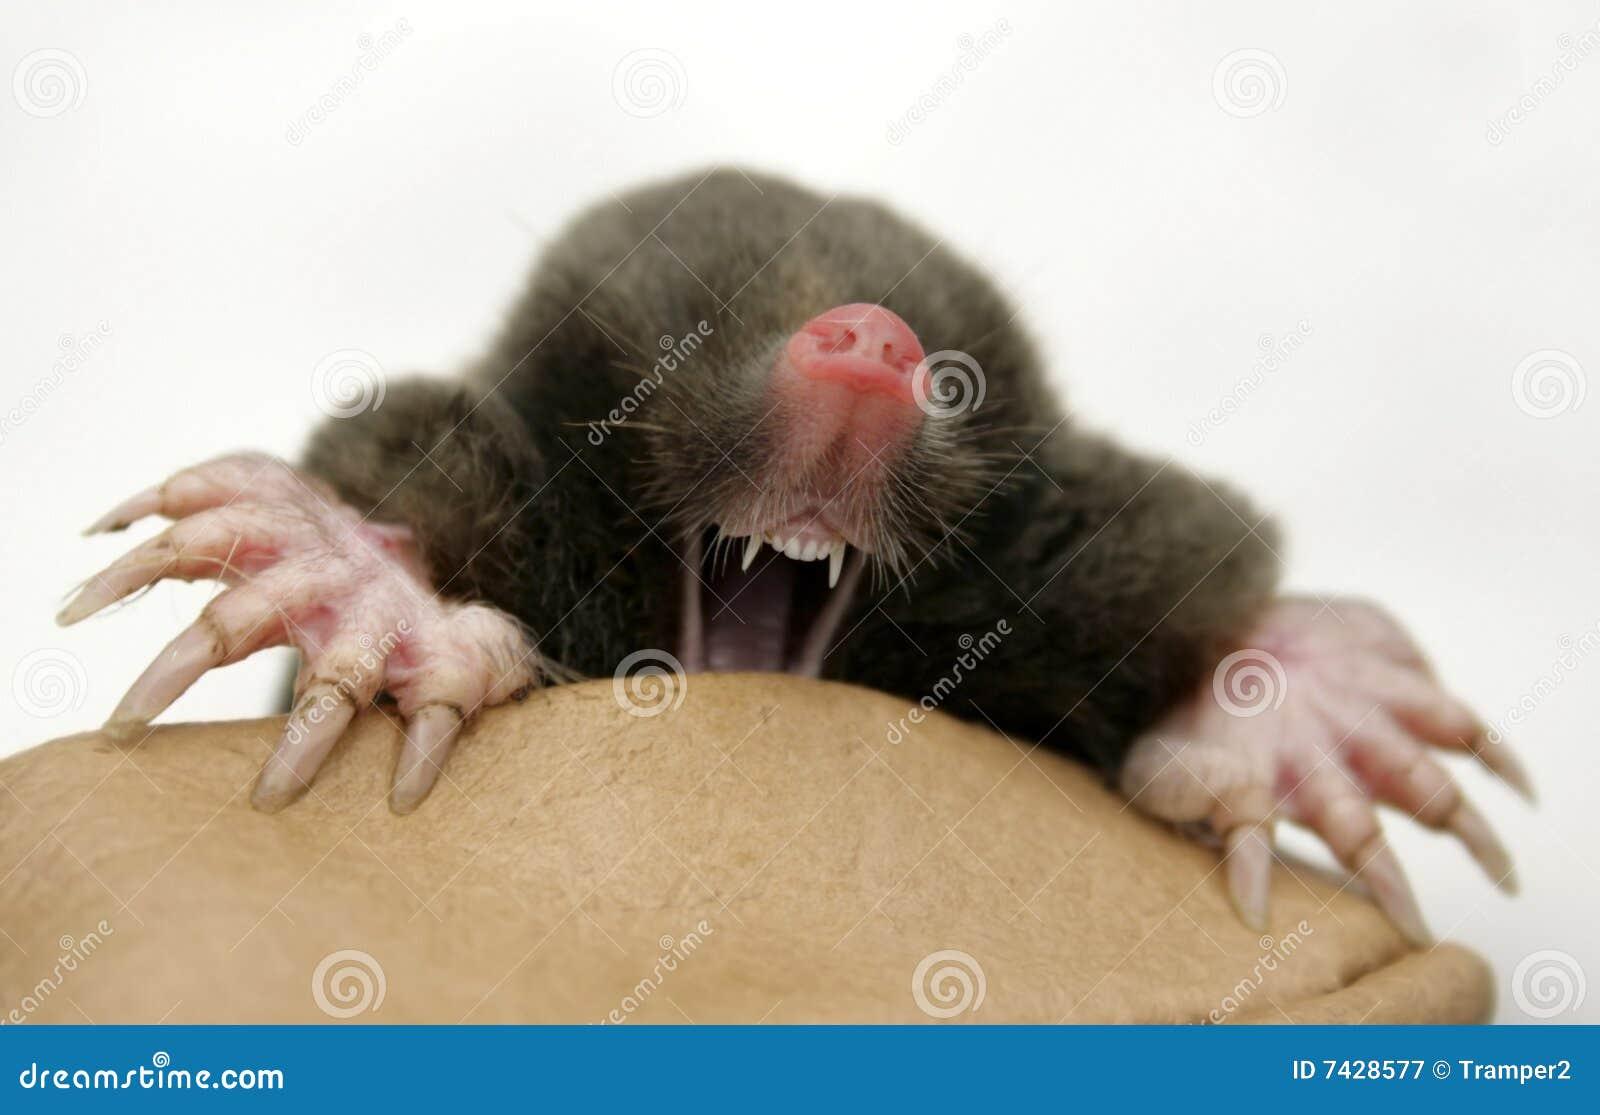 Dangerous mole royalty free stock photography image 7428577